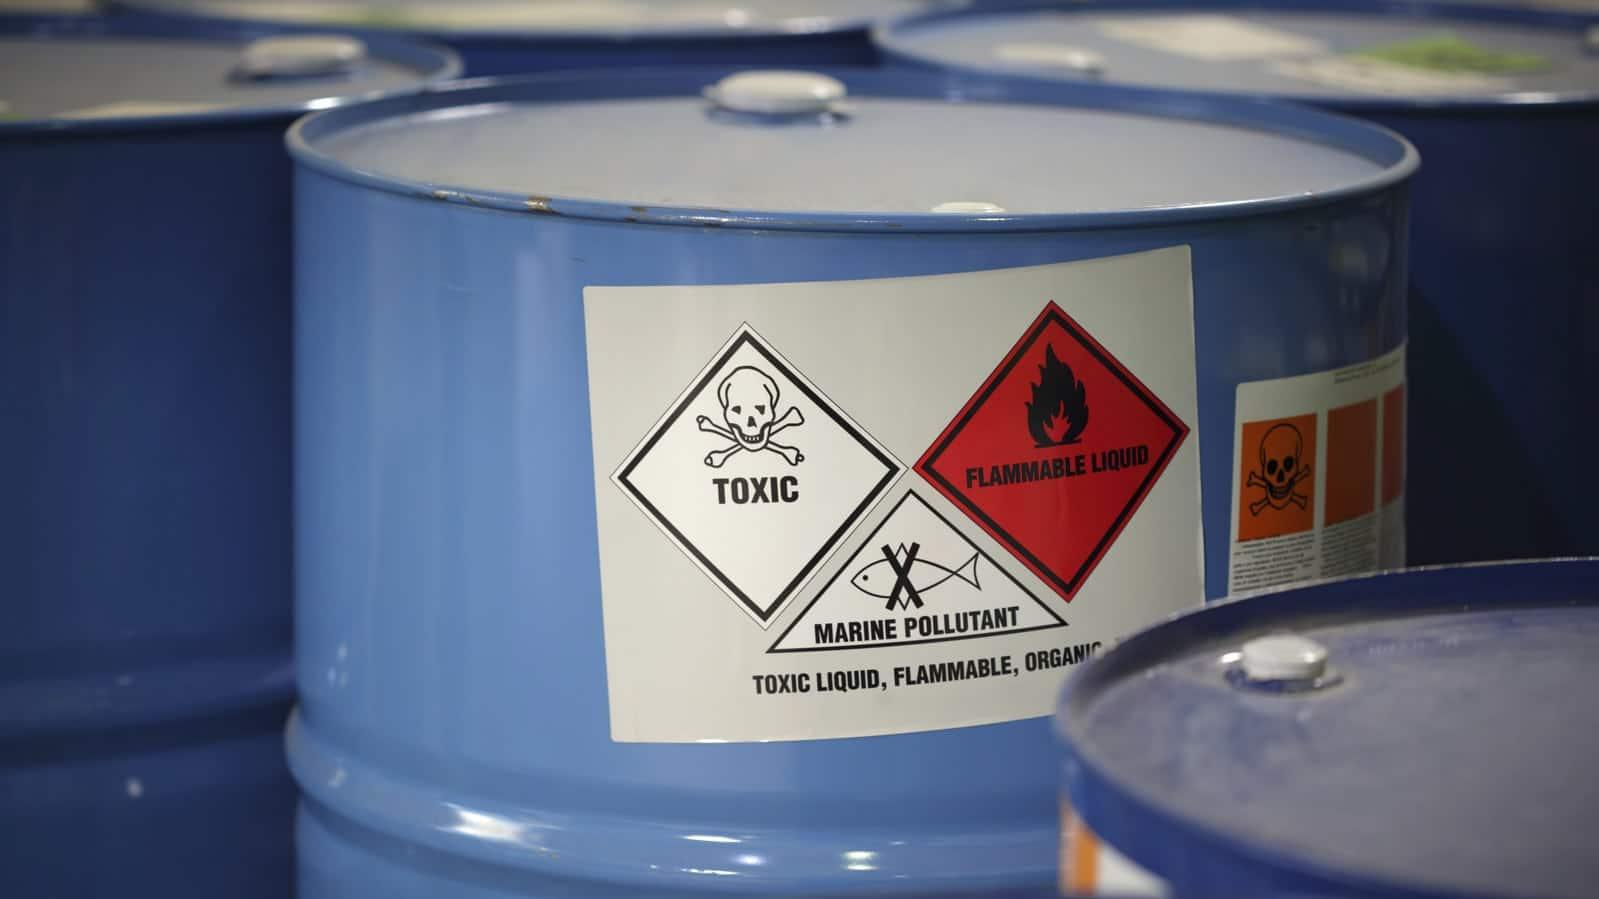 Toxic Flammable Liquid Warning Label